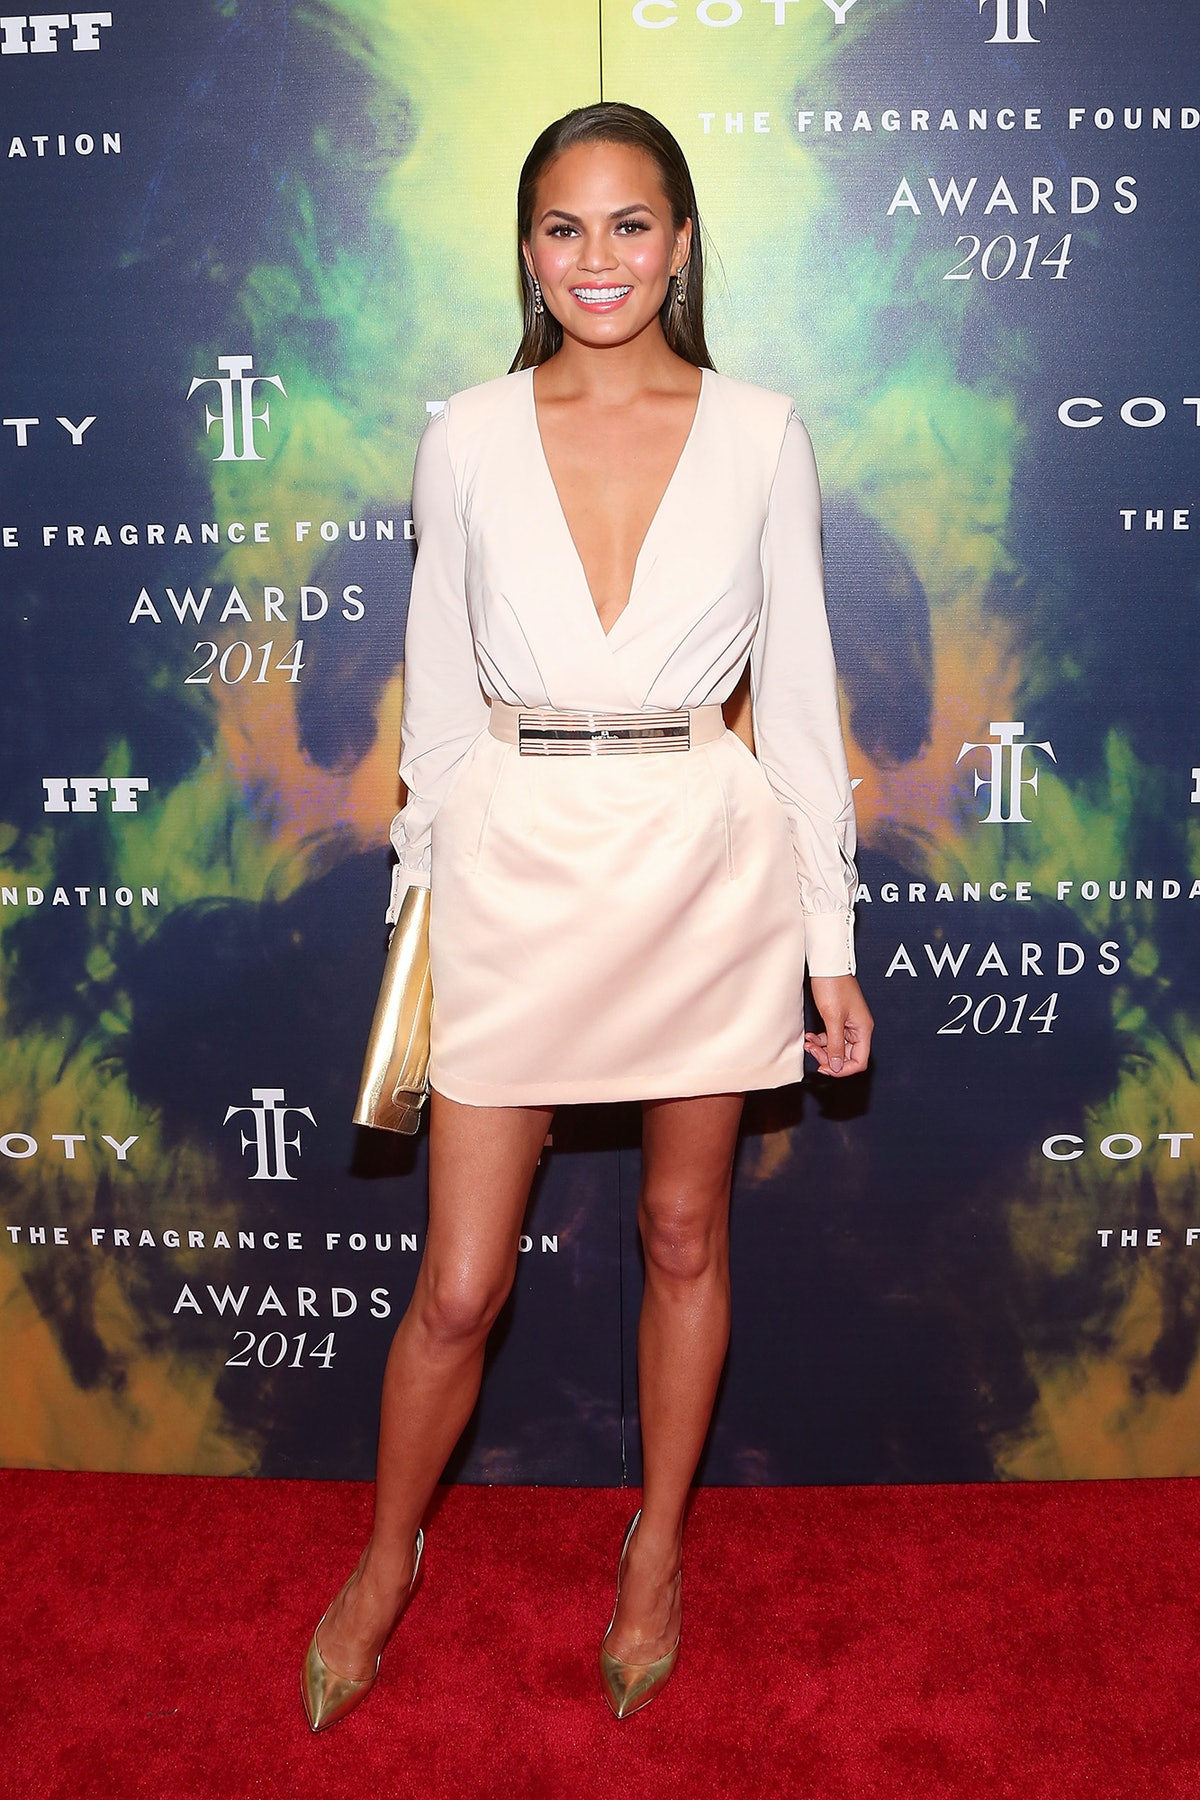 Chrissy Teigen Fragrance Awards